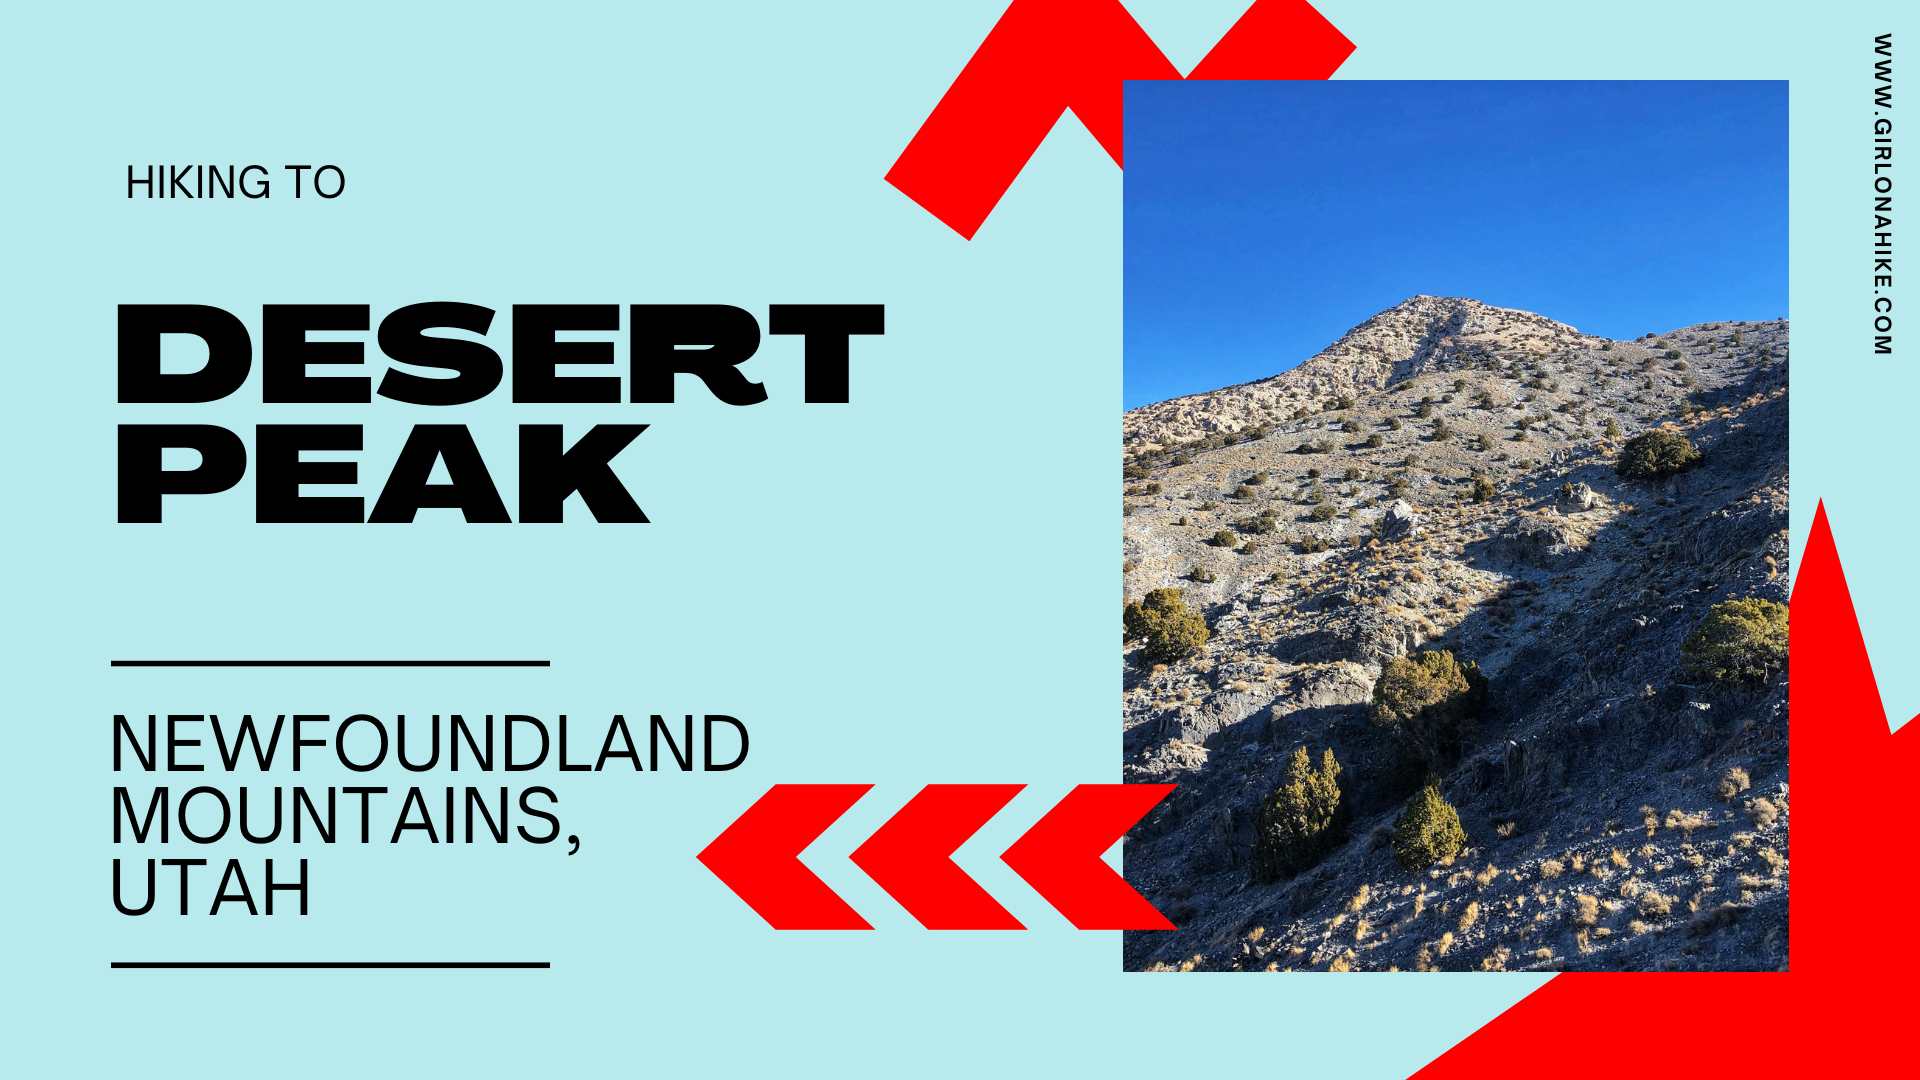 Hiking to Desert Peak, Newfoundland Mountains